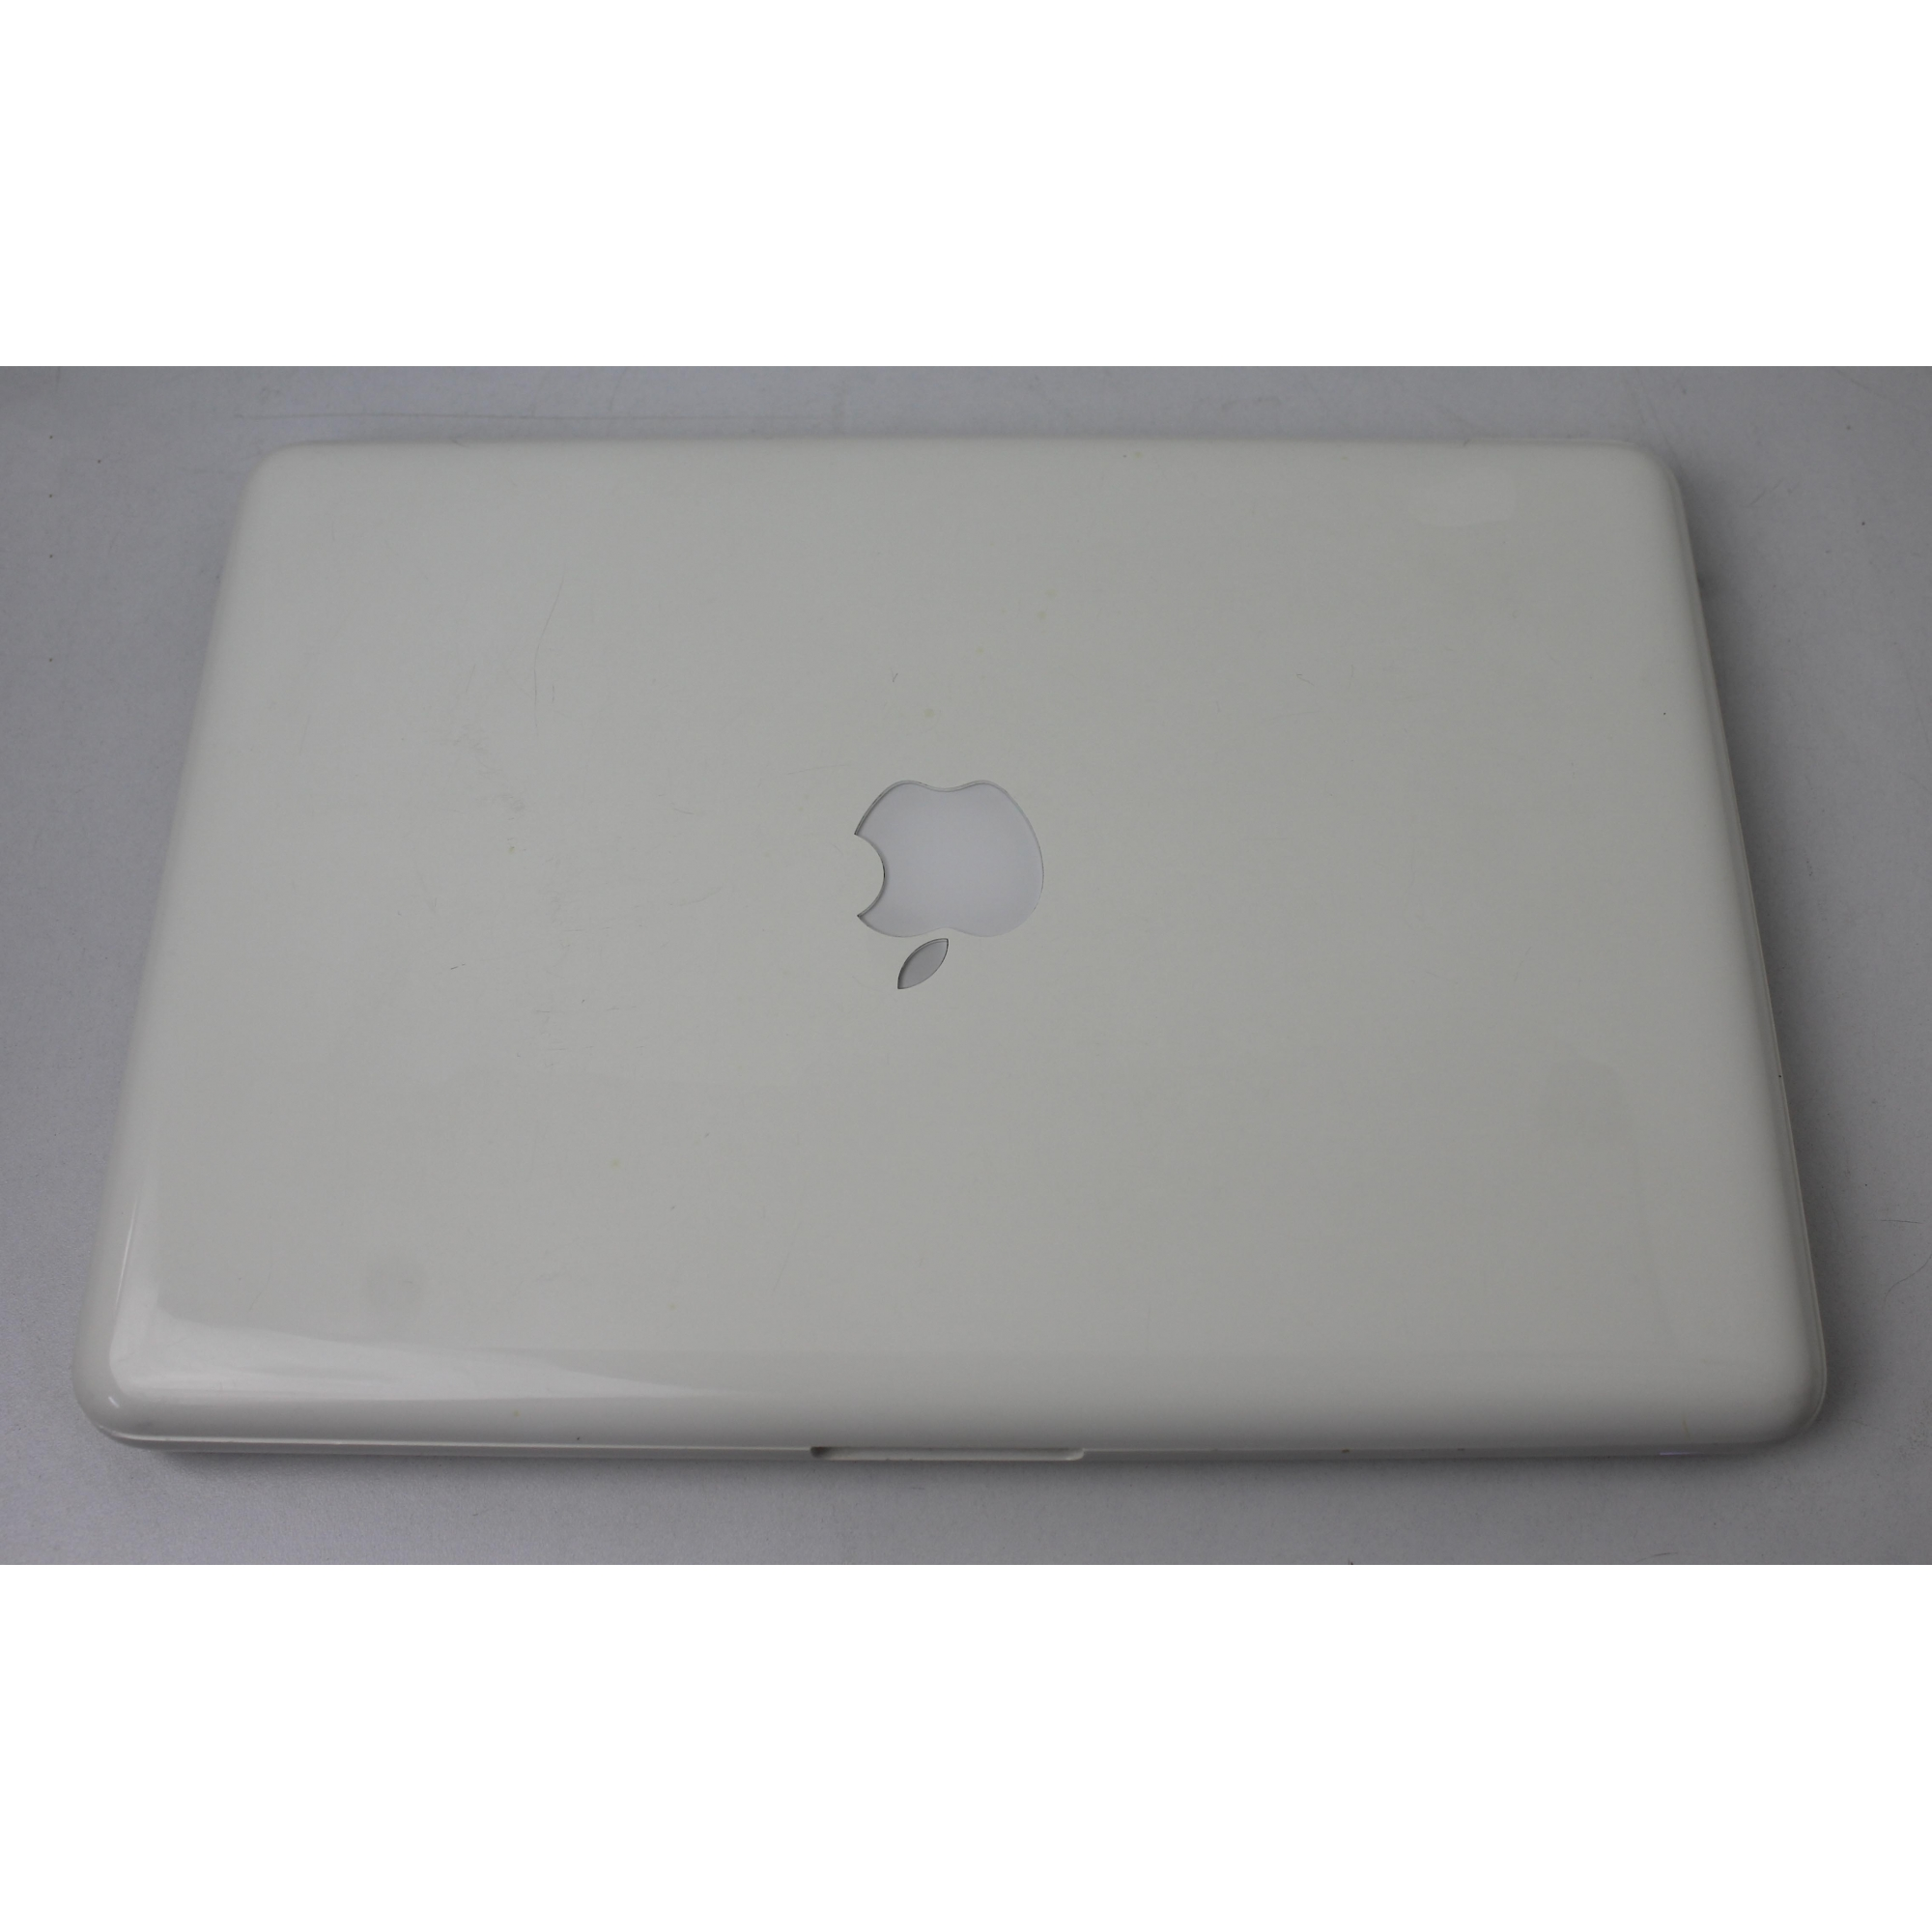 "MACBOOK WHITE MC516LL/A 12"" INTEL CORE 2 DUO 2.4GHZ 4GB HD-250GB - NÃO ENVIAMOS"